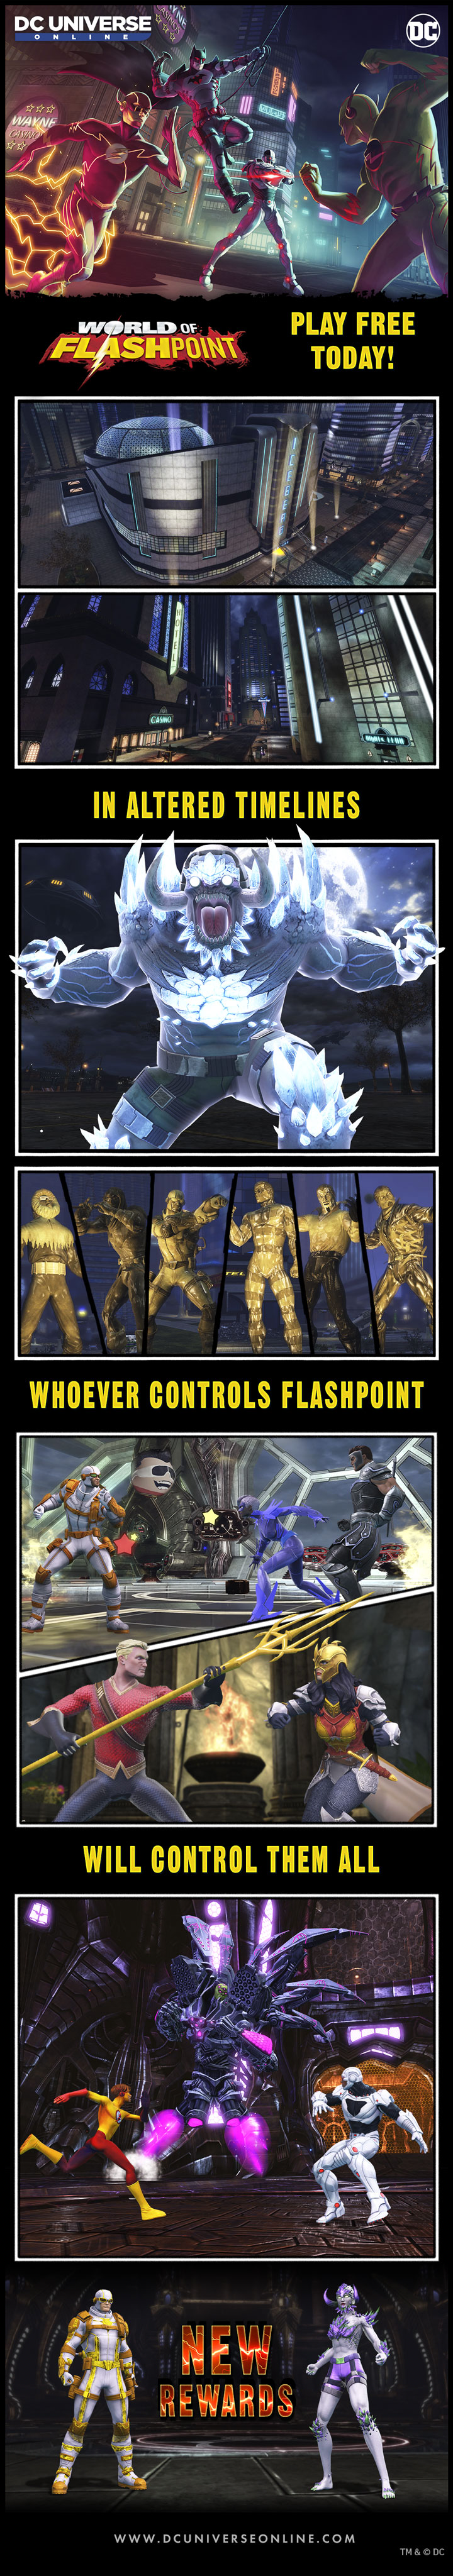 761.jpg?v=1 - DCUO - Episodio 40: Mundo de Flashpoint